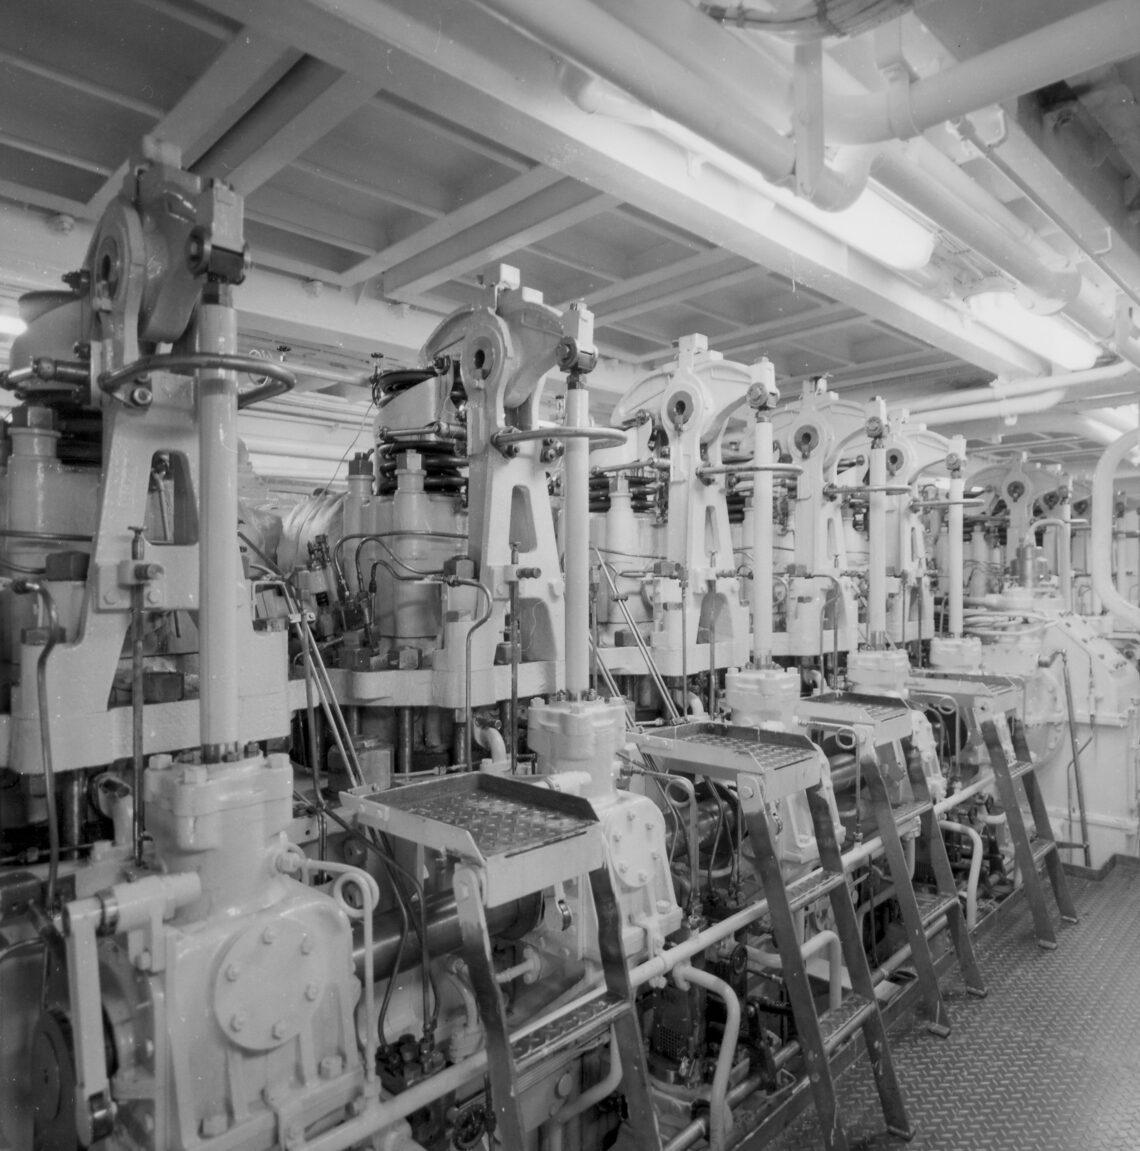 Maskinrummet om bord på M/S ARVEPRINS KNUD.